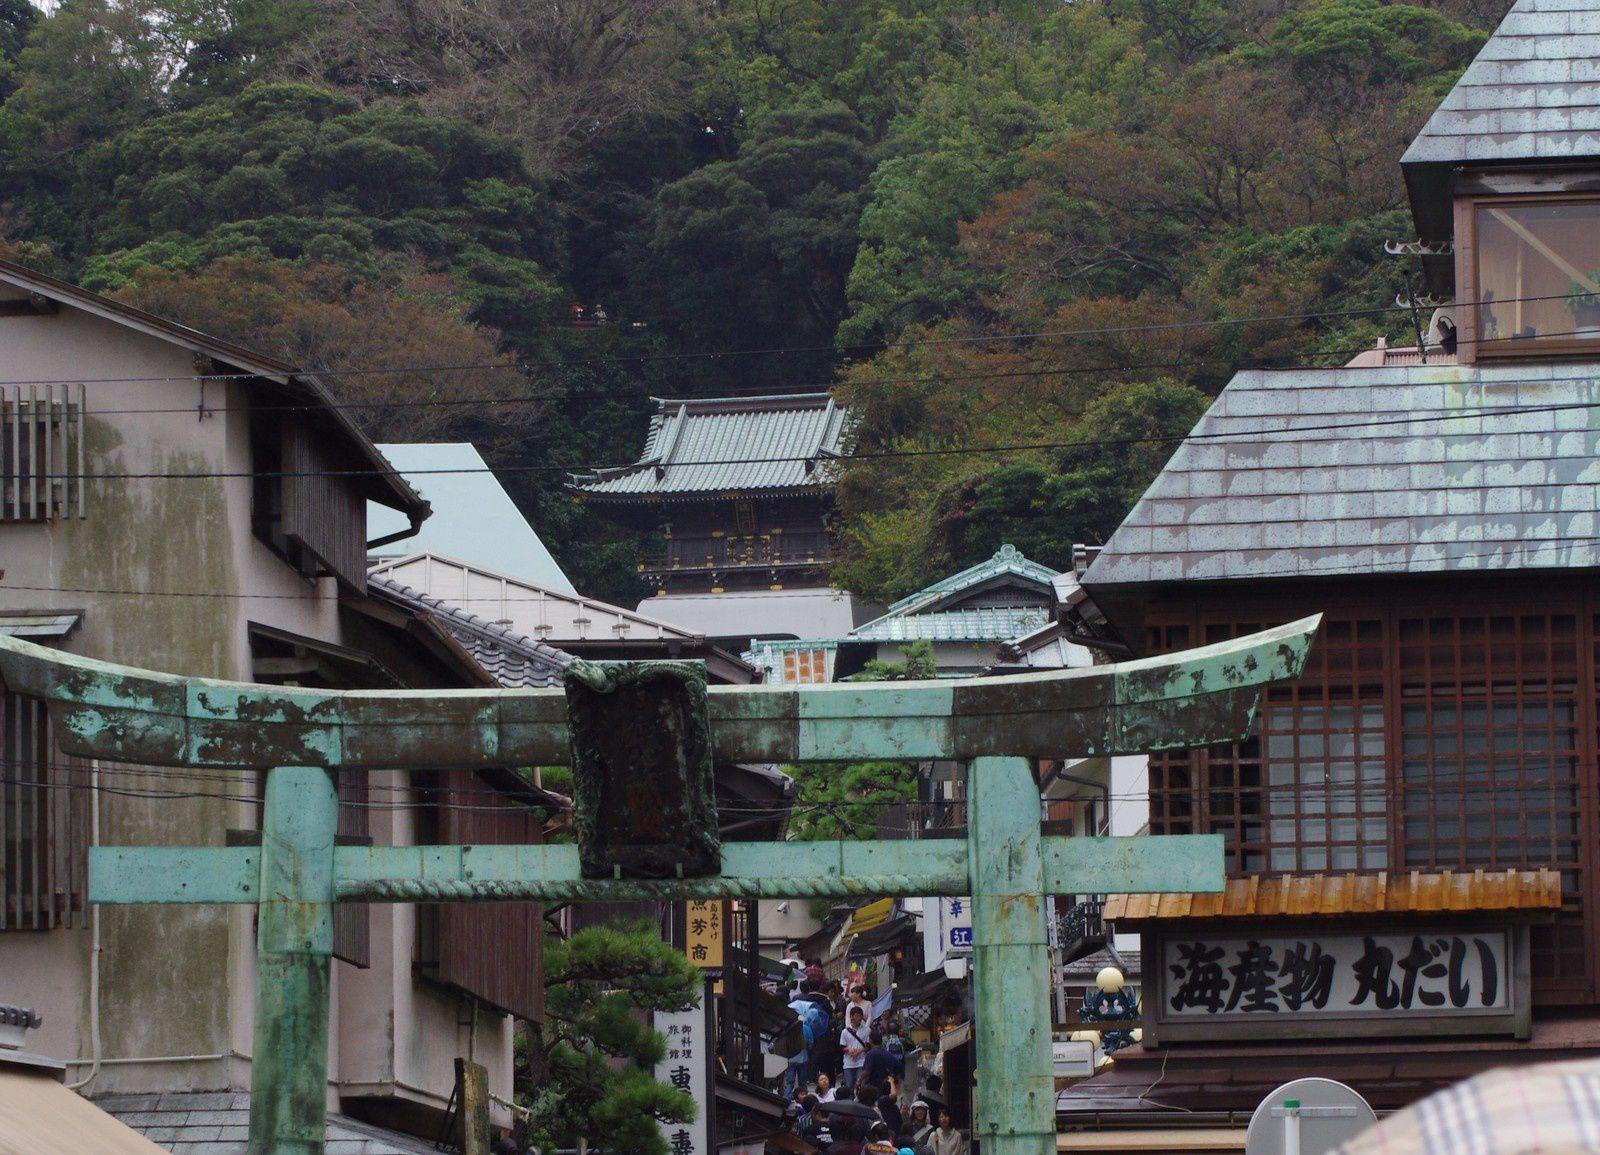 Kanagawa (numéro 14 sur la carte) 1:Kamakura et Enoshima